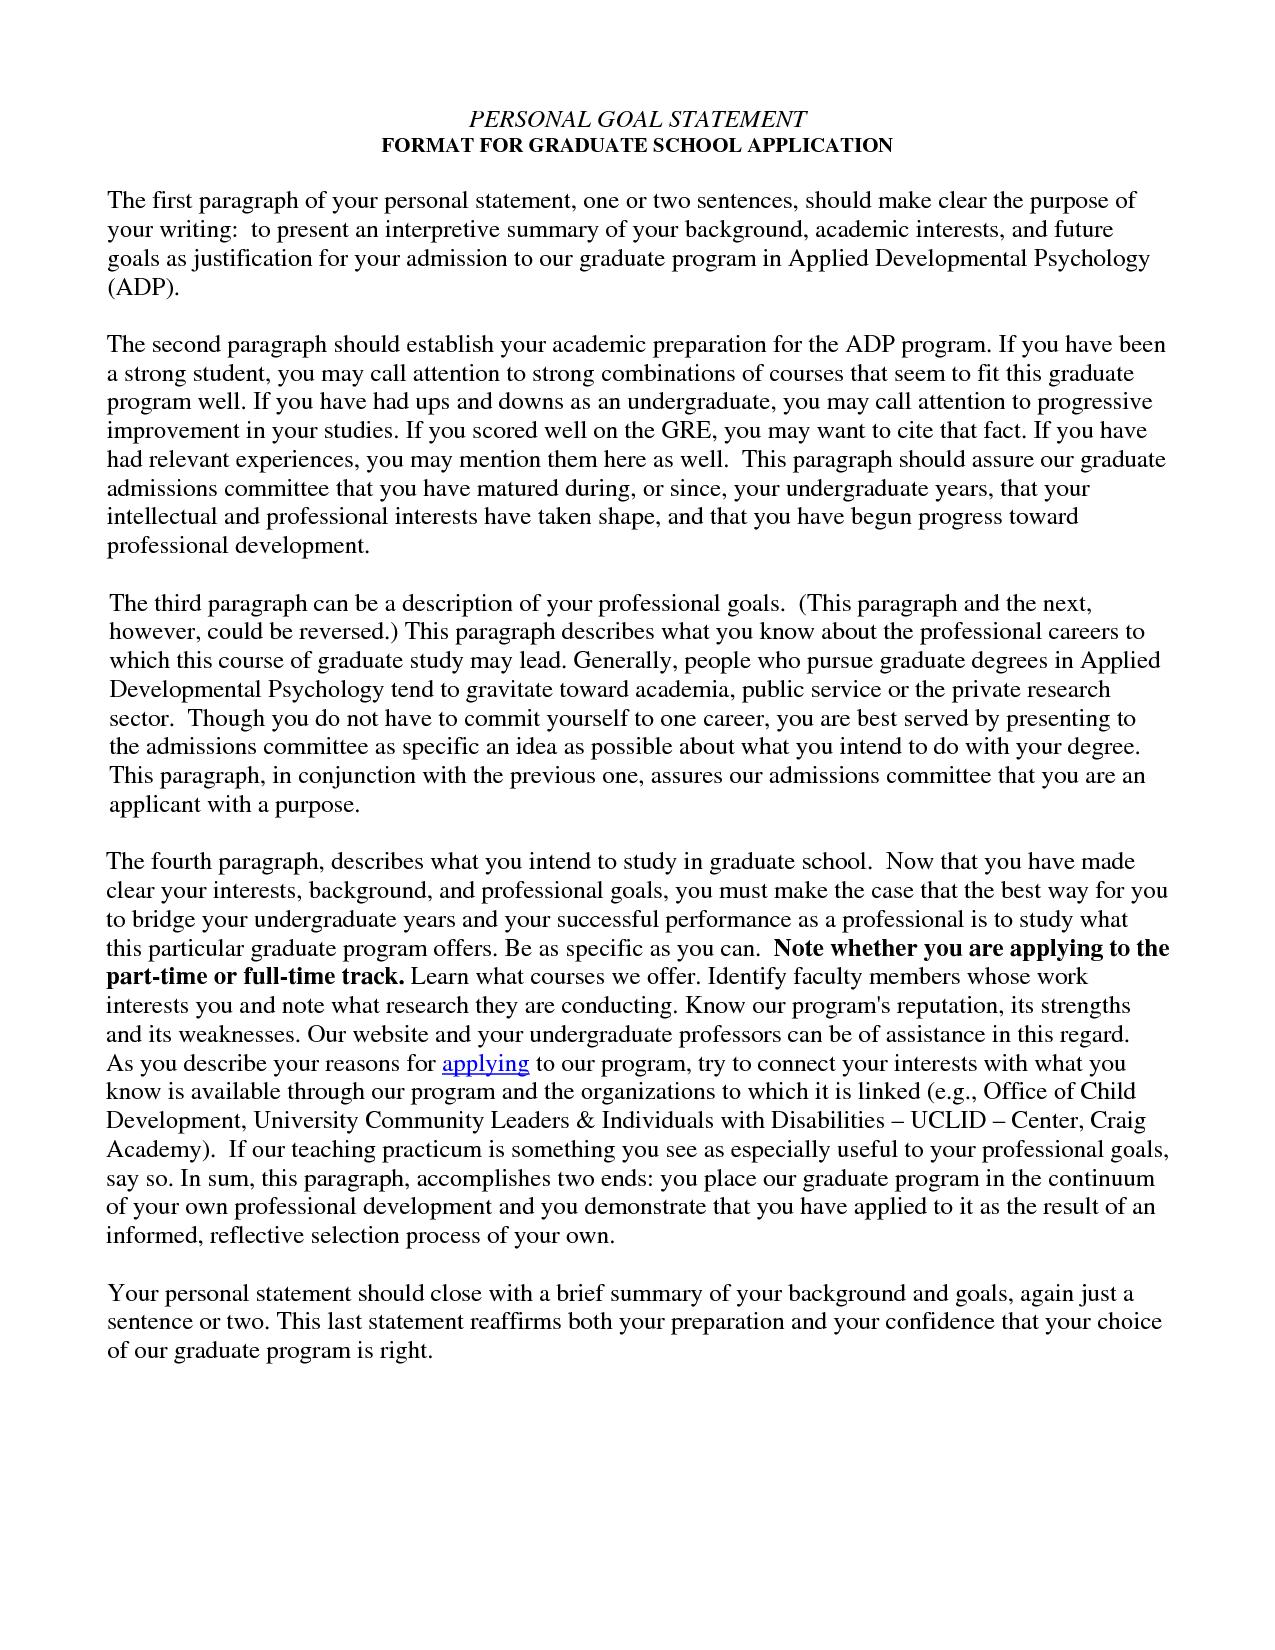 001 Personal Goals Essay Amazing For Graduate School Outline Goal College Full